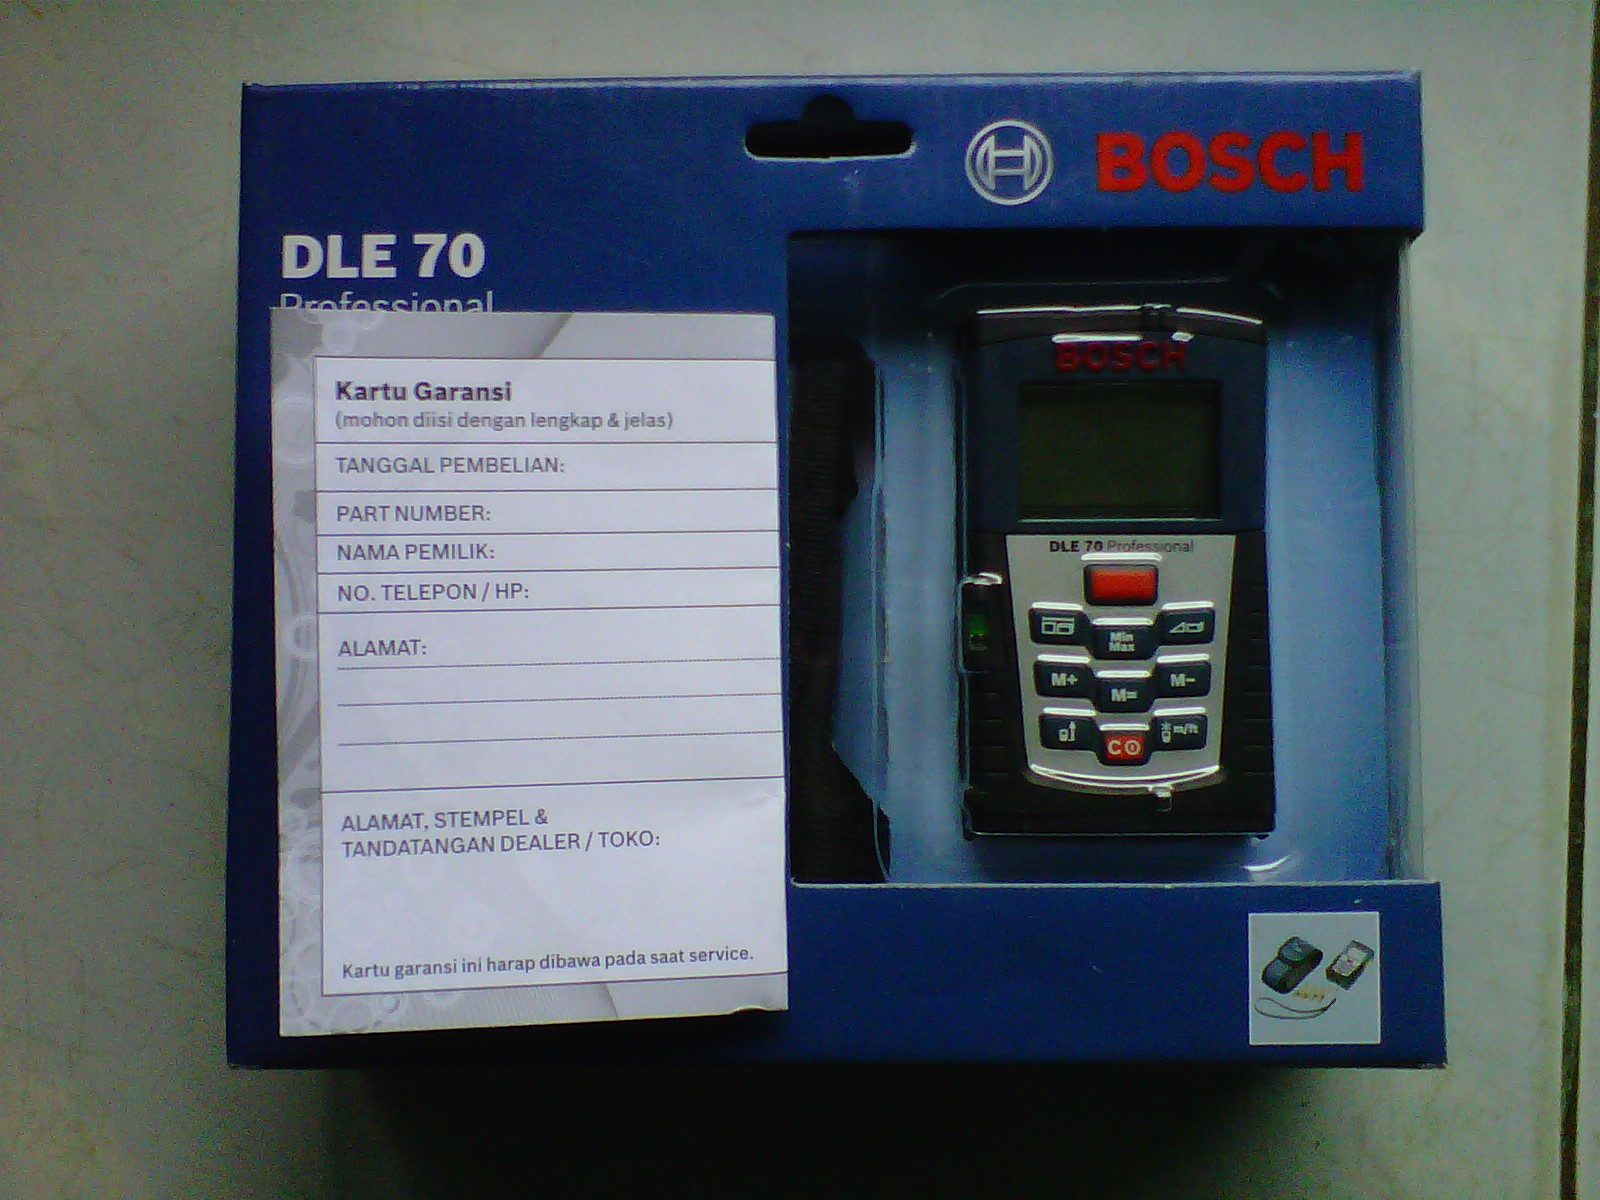 Bosch Entfernungsmesser Dle 70 : Jual meteran laser bosch dle 70 professional toko peralatan